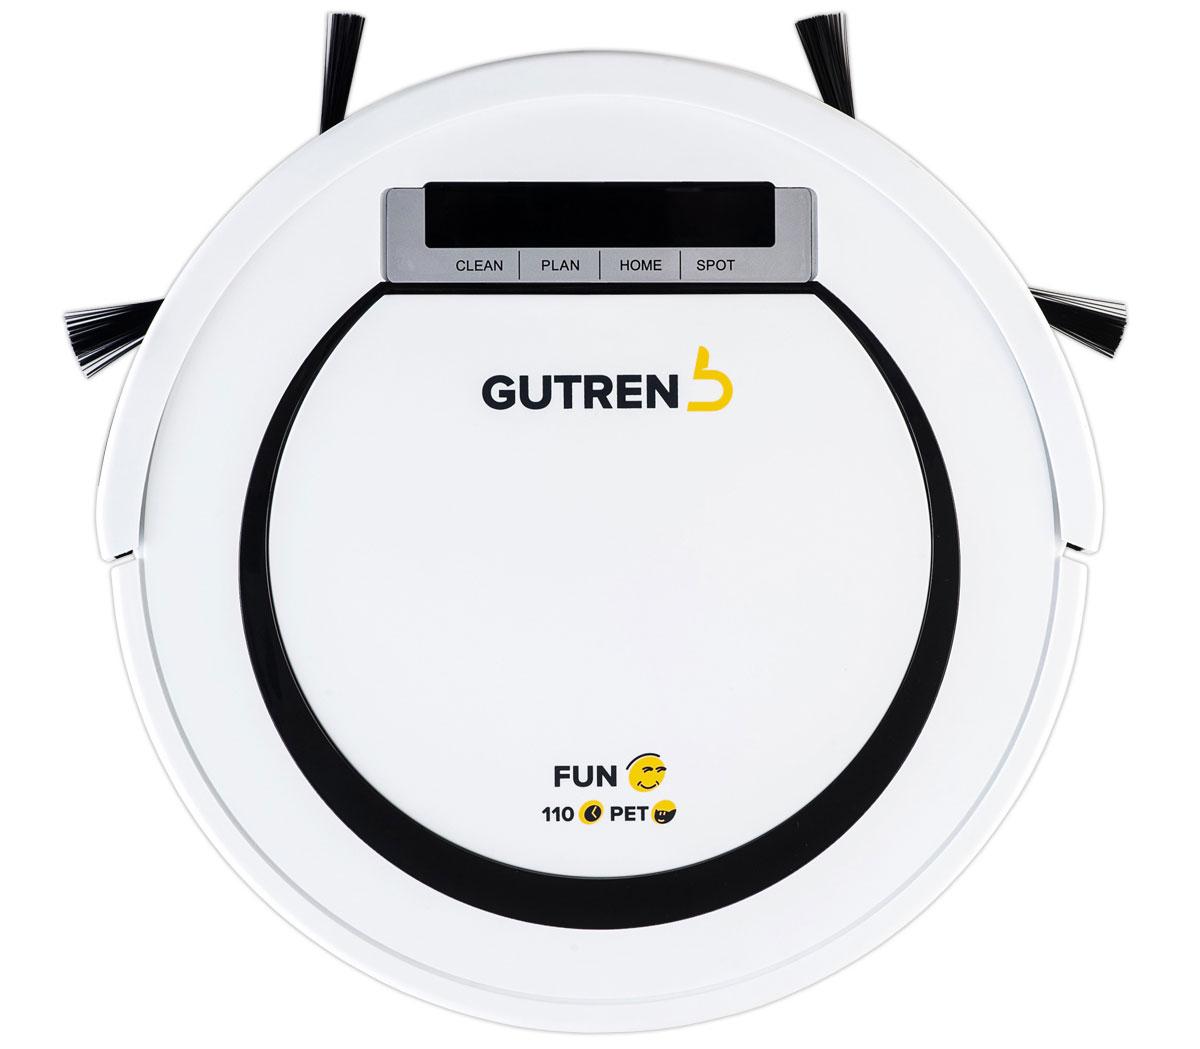 Gutrend Fun 110 Pet, White Black робот-пылесос